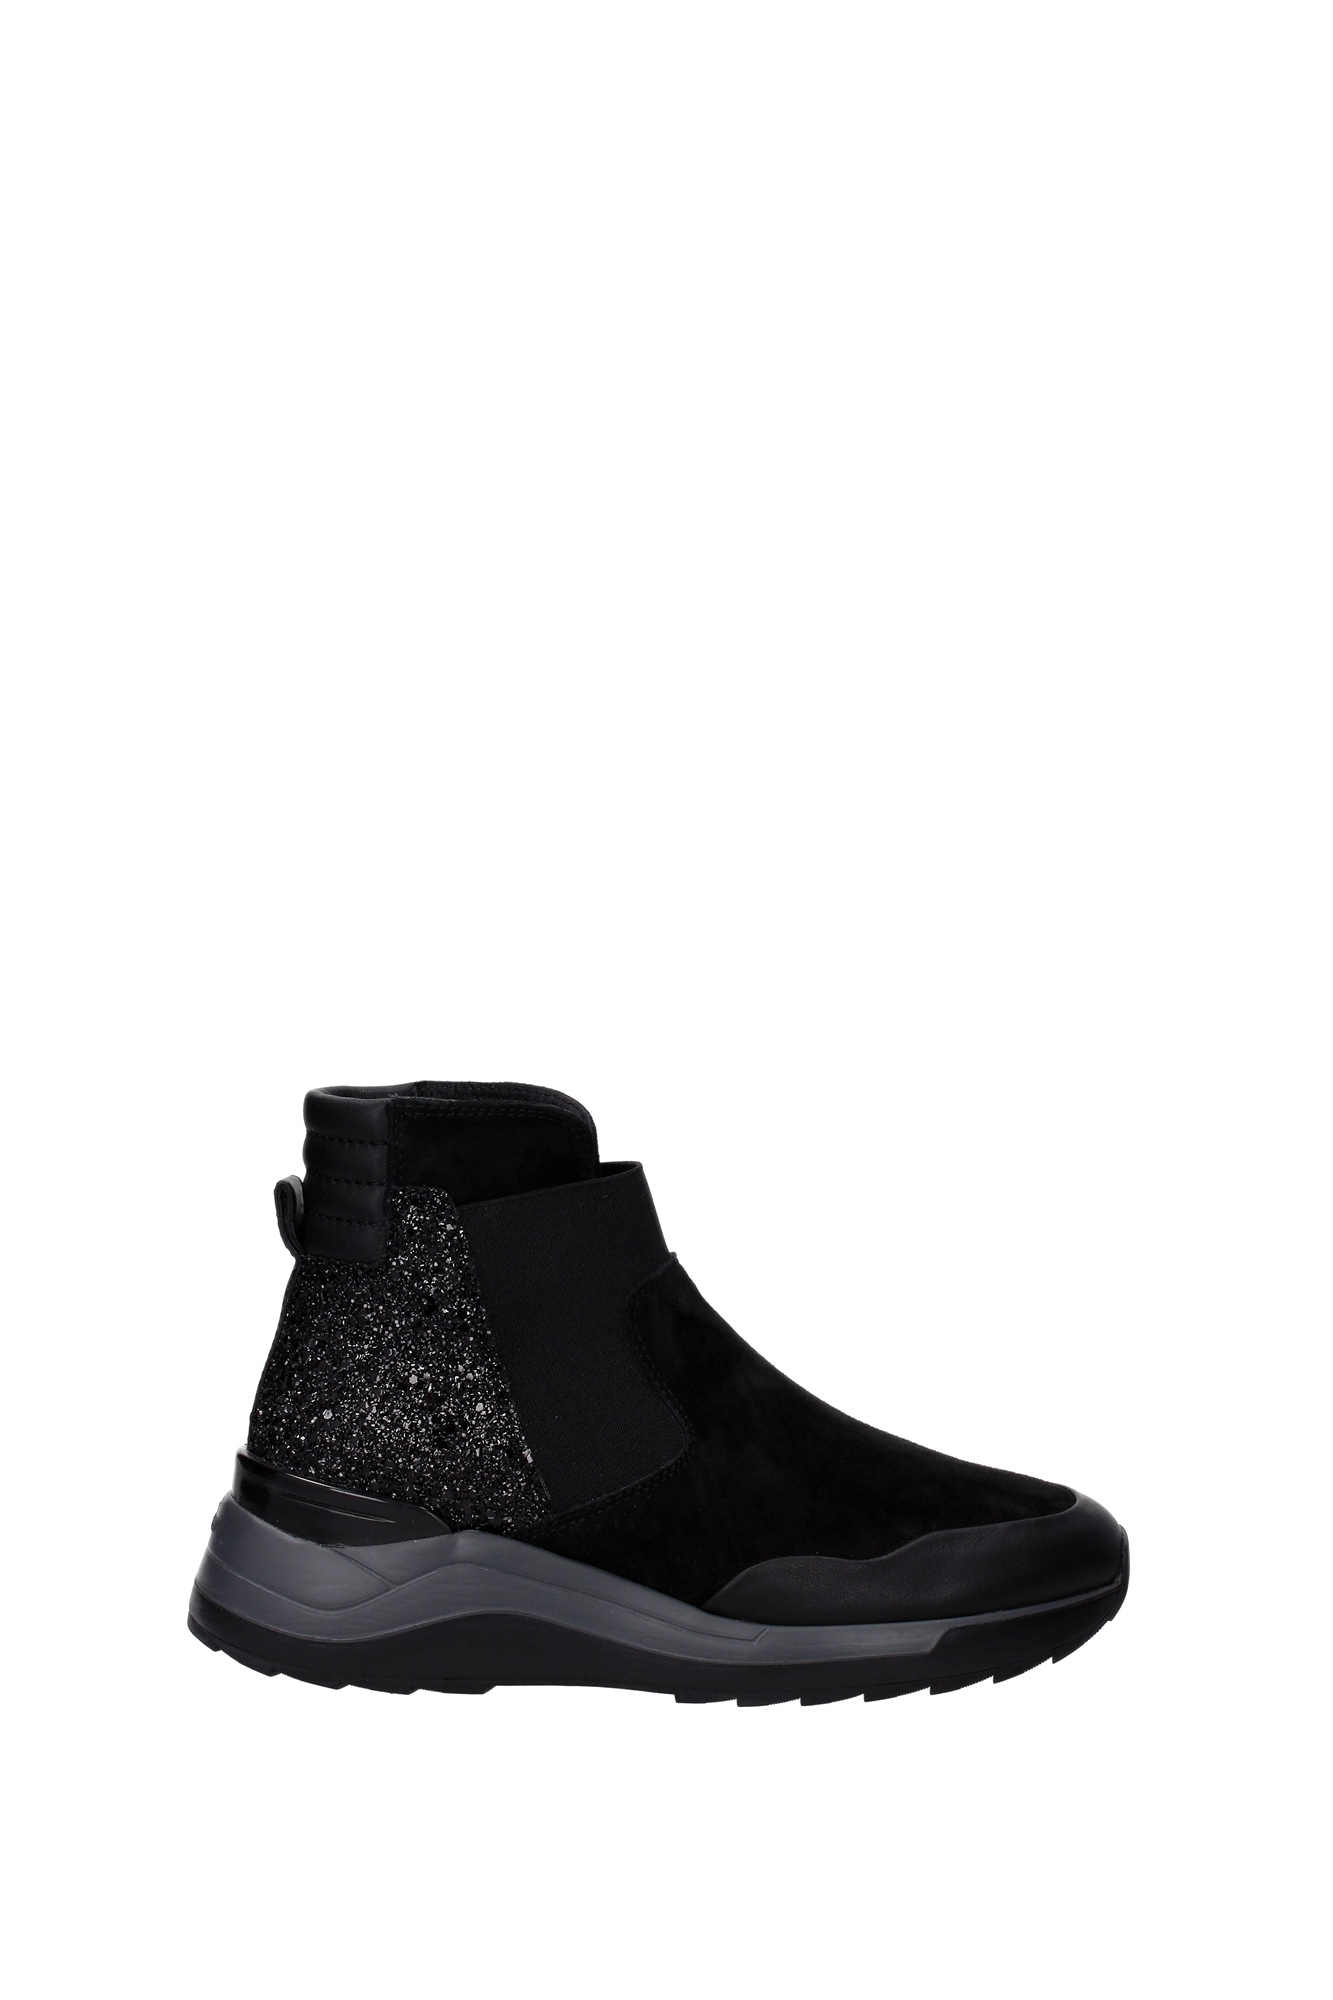 Sneakers Hogan Donna Donna Donna -  (HXW2960V520EK6B999) 1131cf